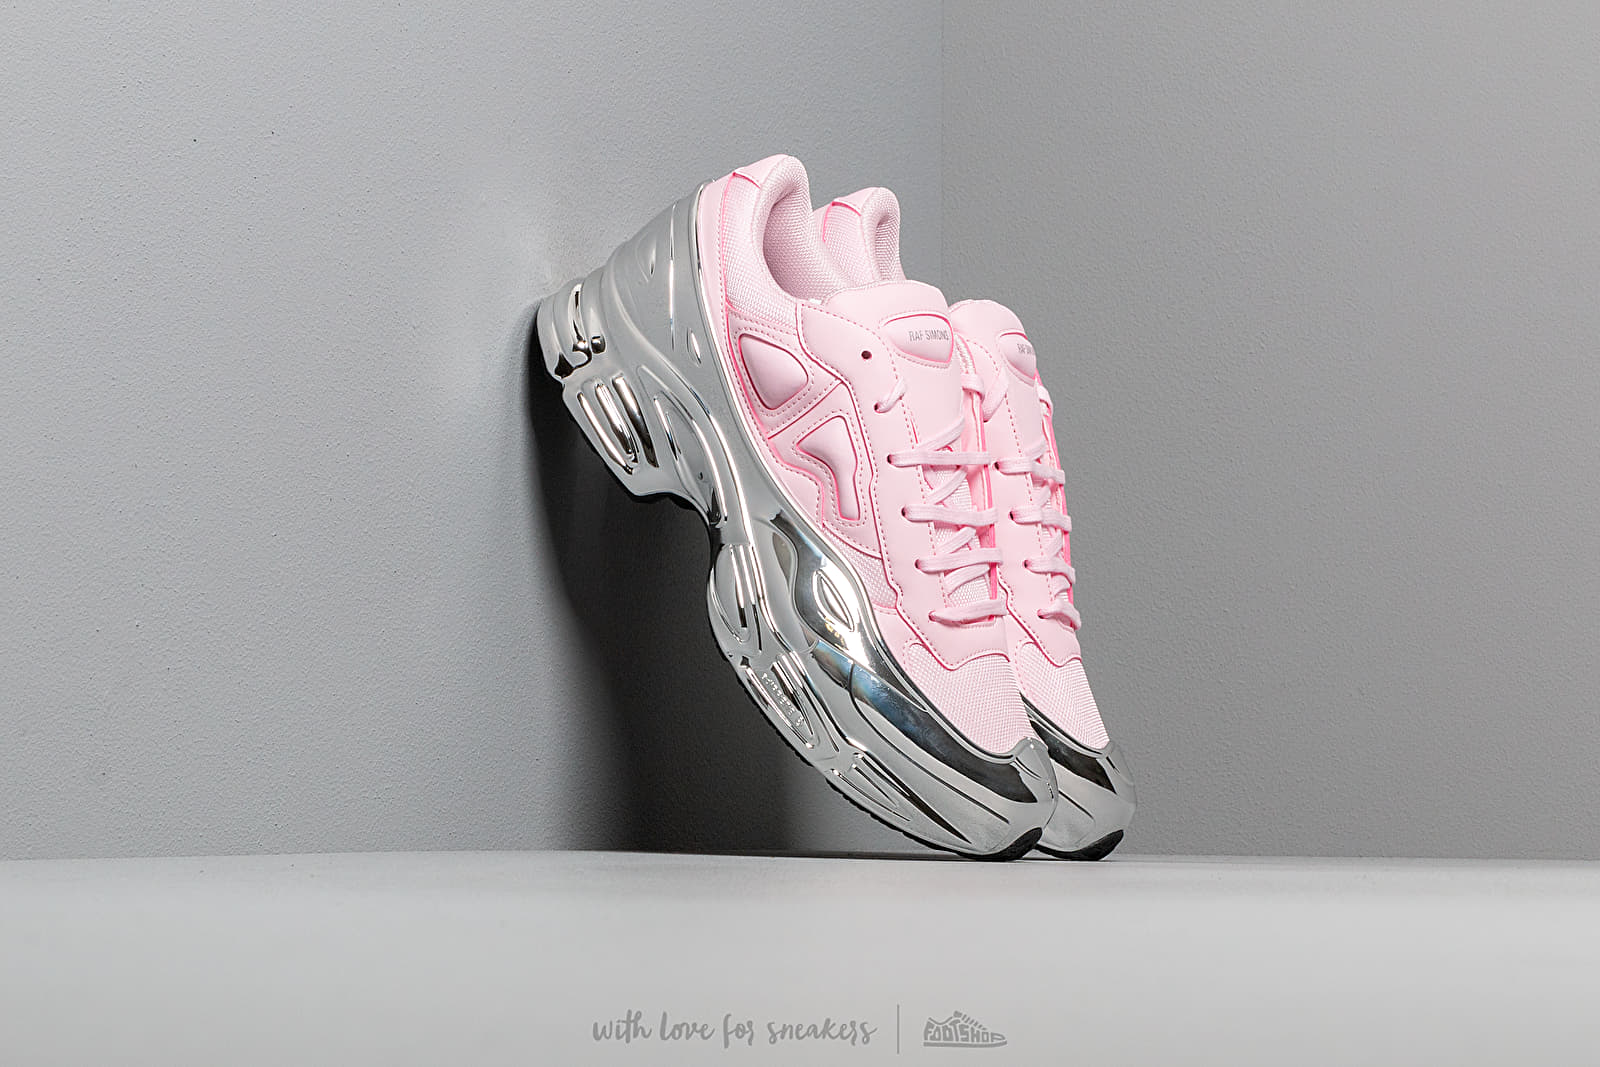 adidas x Raf Simons Ozweego Clear Pink/ Silver Metallic/ Silver Metallic za skvělou cenu 9 490 Kč koupíte na Footshop.cz